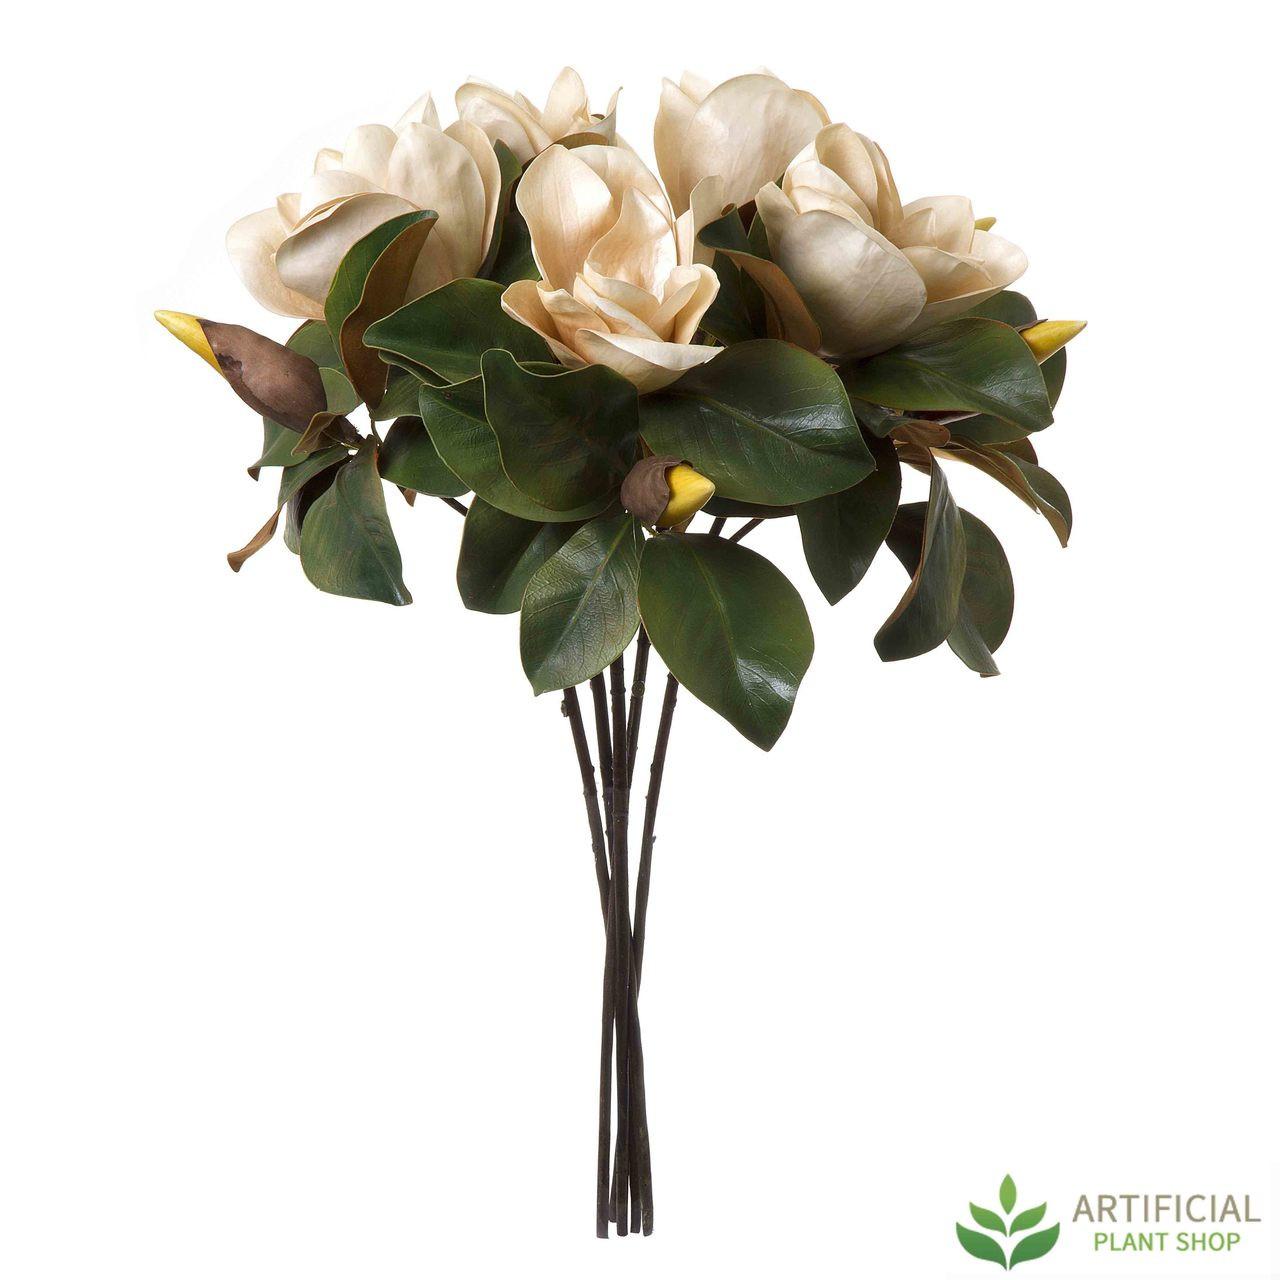 Coffee Magnolia flower bundle